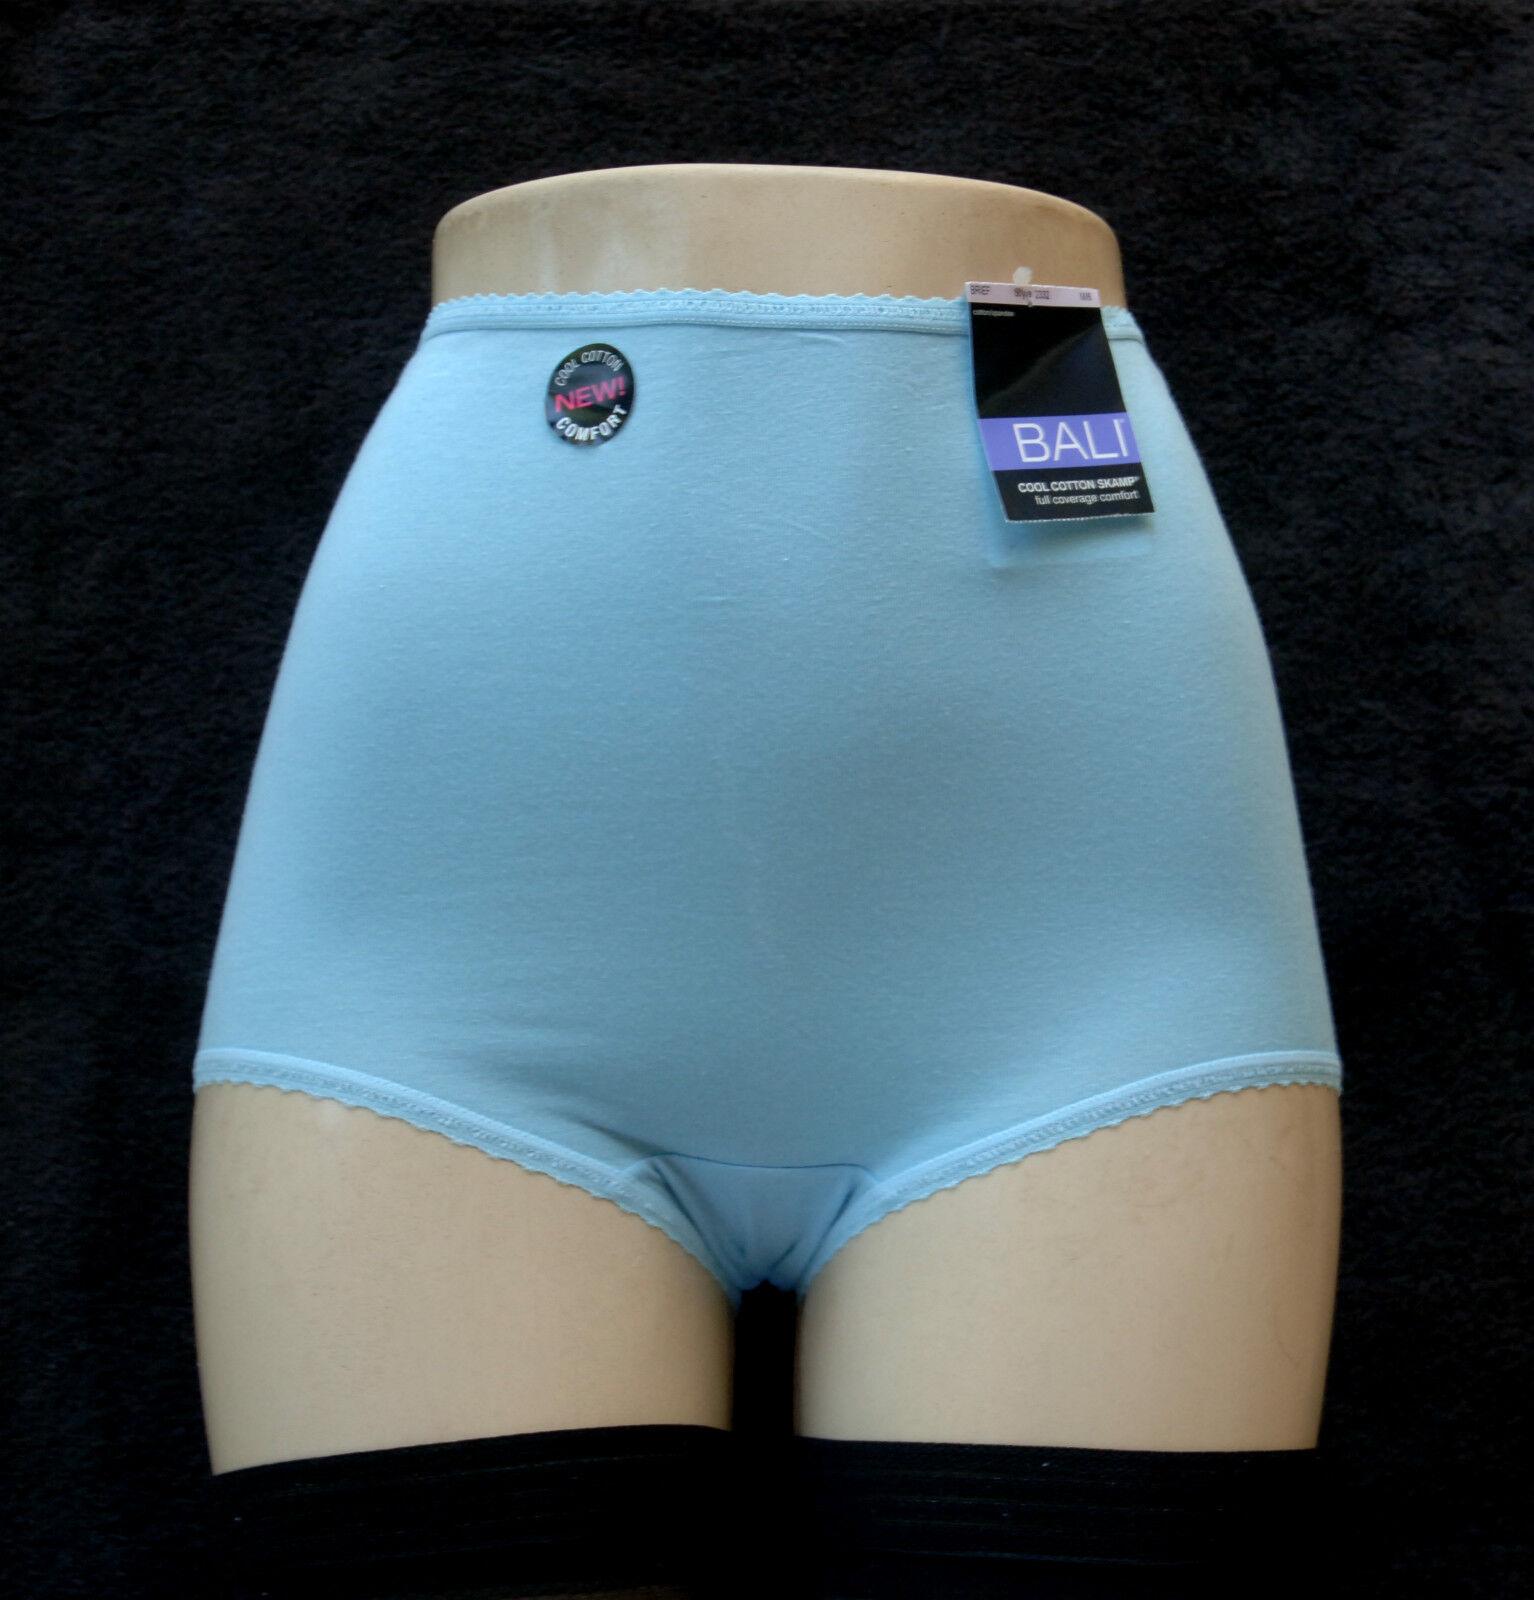 In satin ladies pics Jamaicans panties